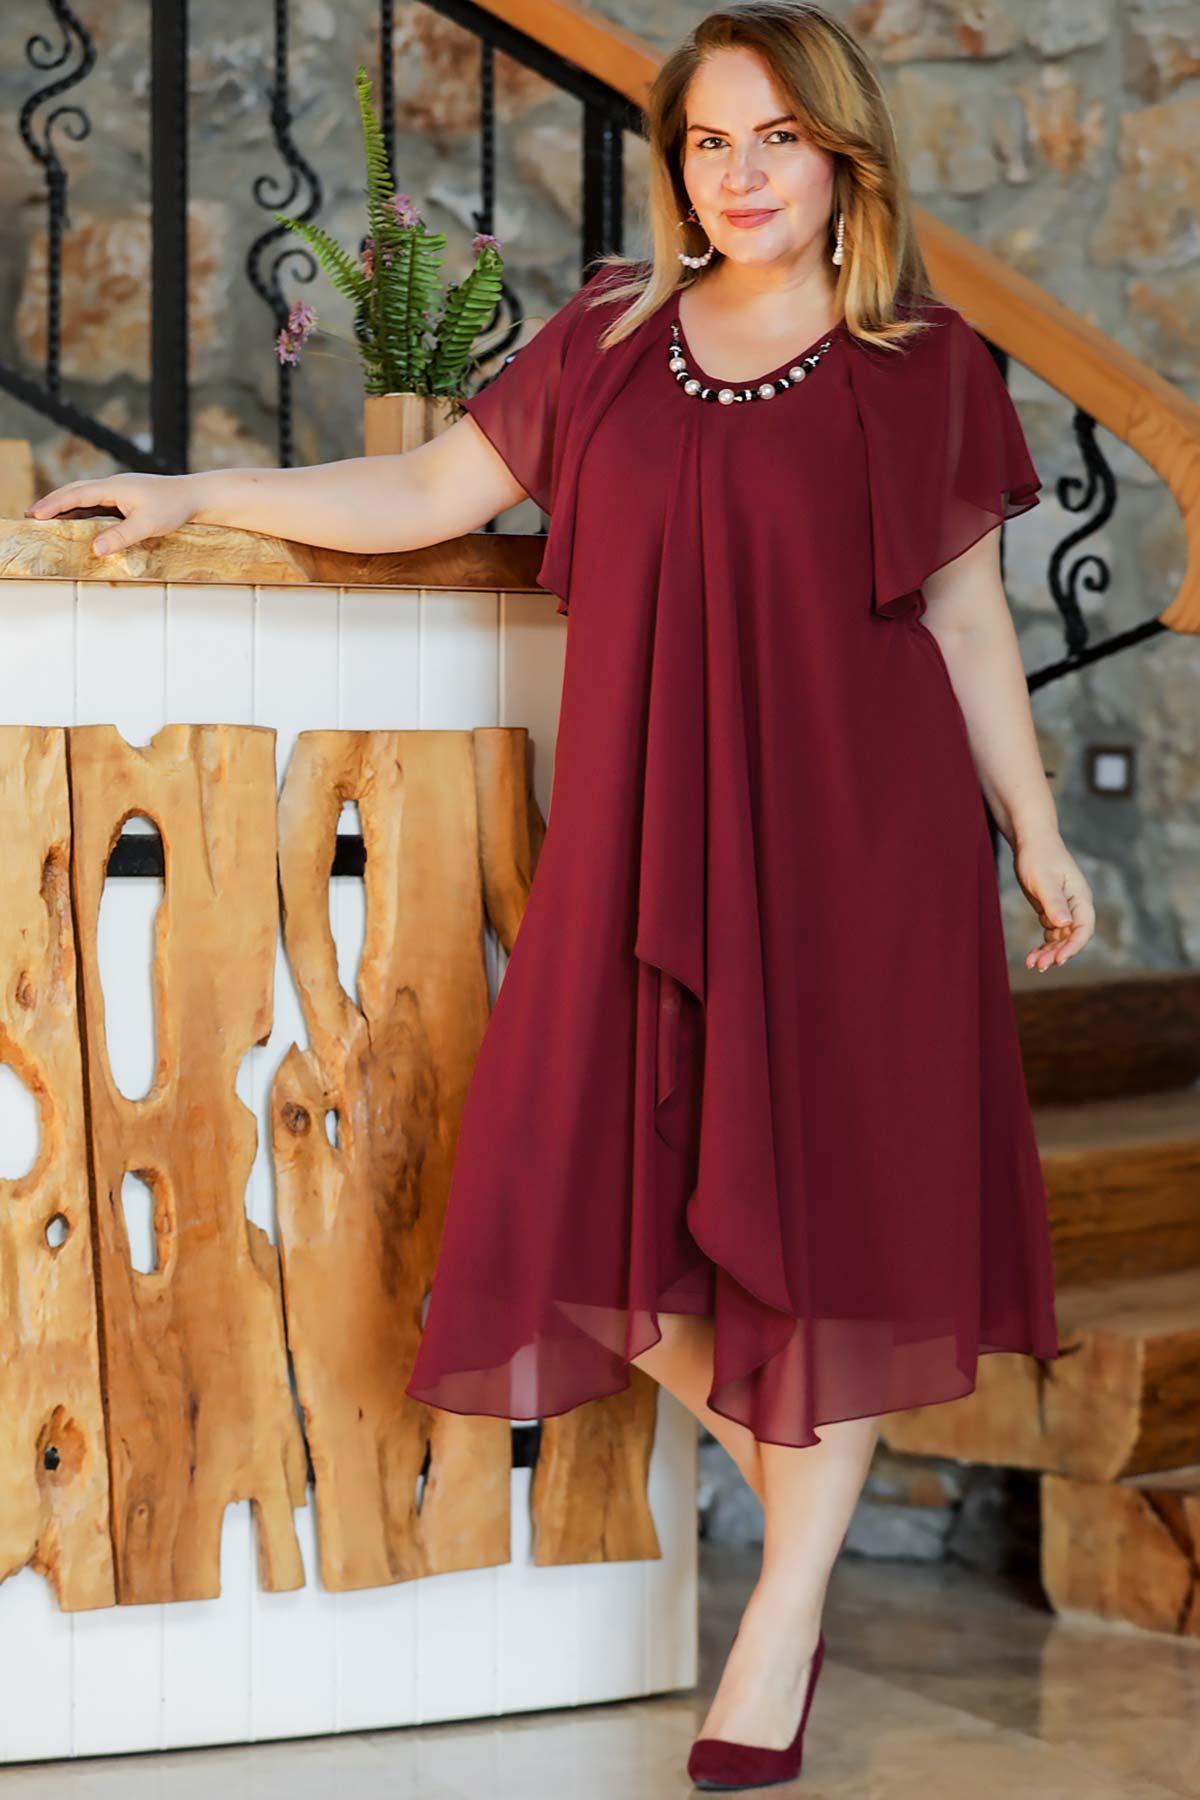 LARGE SIZE ŞİFON MİDİ SIZE ABİYE DRESS dress meeting dress 2021 summer dress long sleeve dress Wedding gown фото